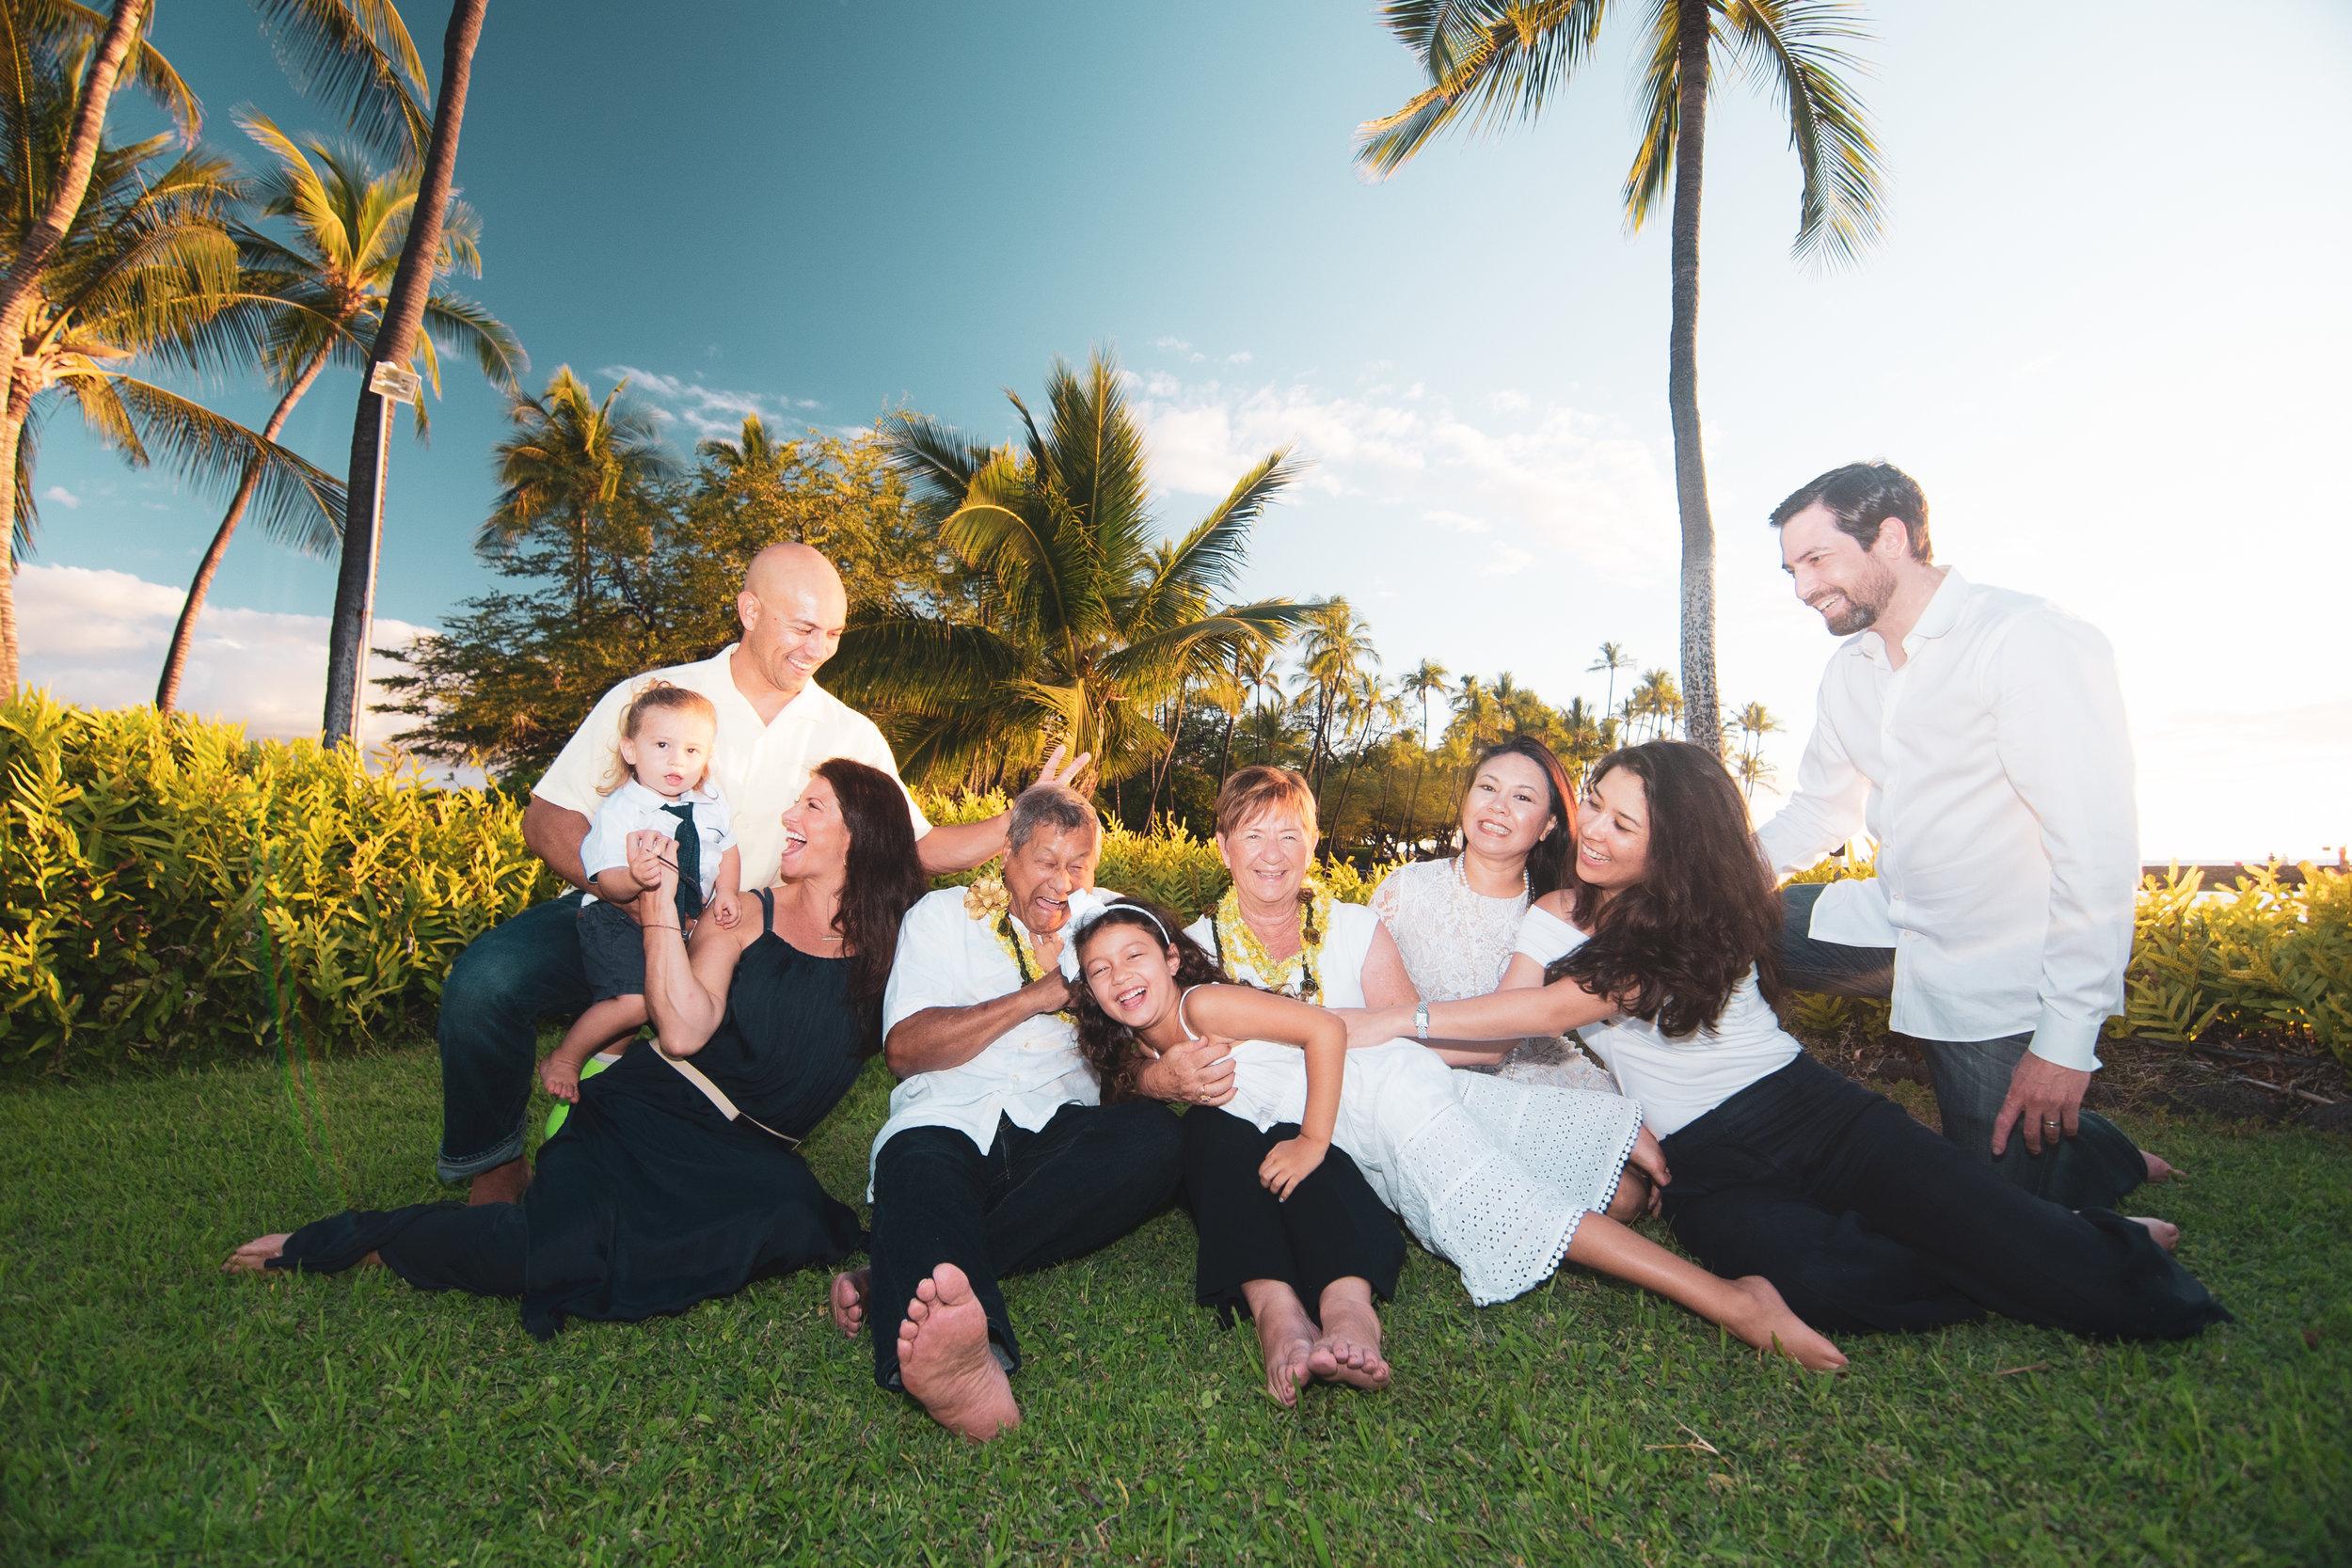 big island hawaii kona lifestyle beach family © kelilina photography 20190609184555.jpg